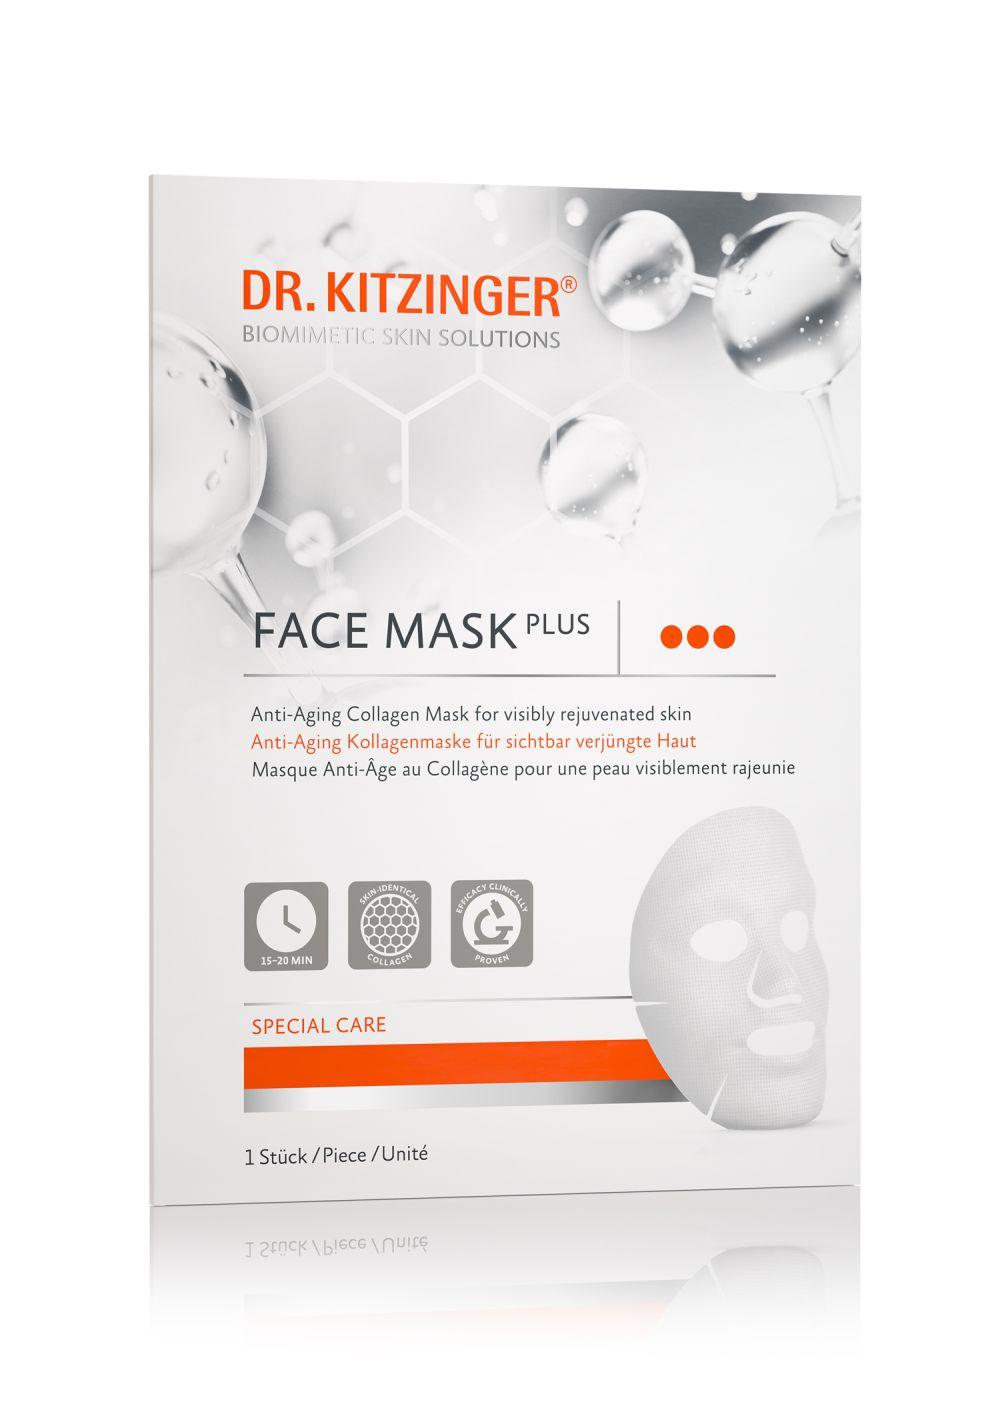 Dr. Kitzinger - 1x Face Mask Plus - Anti-Aging Kollagenmaske